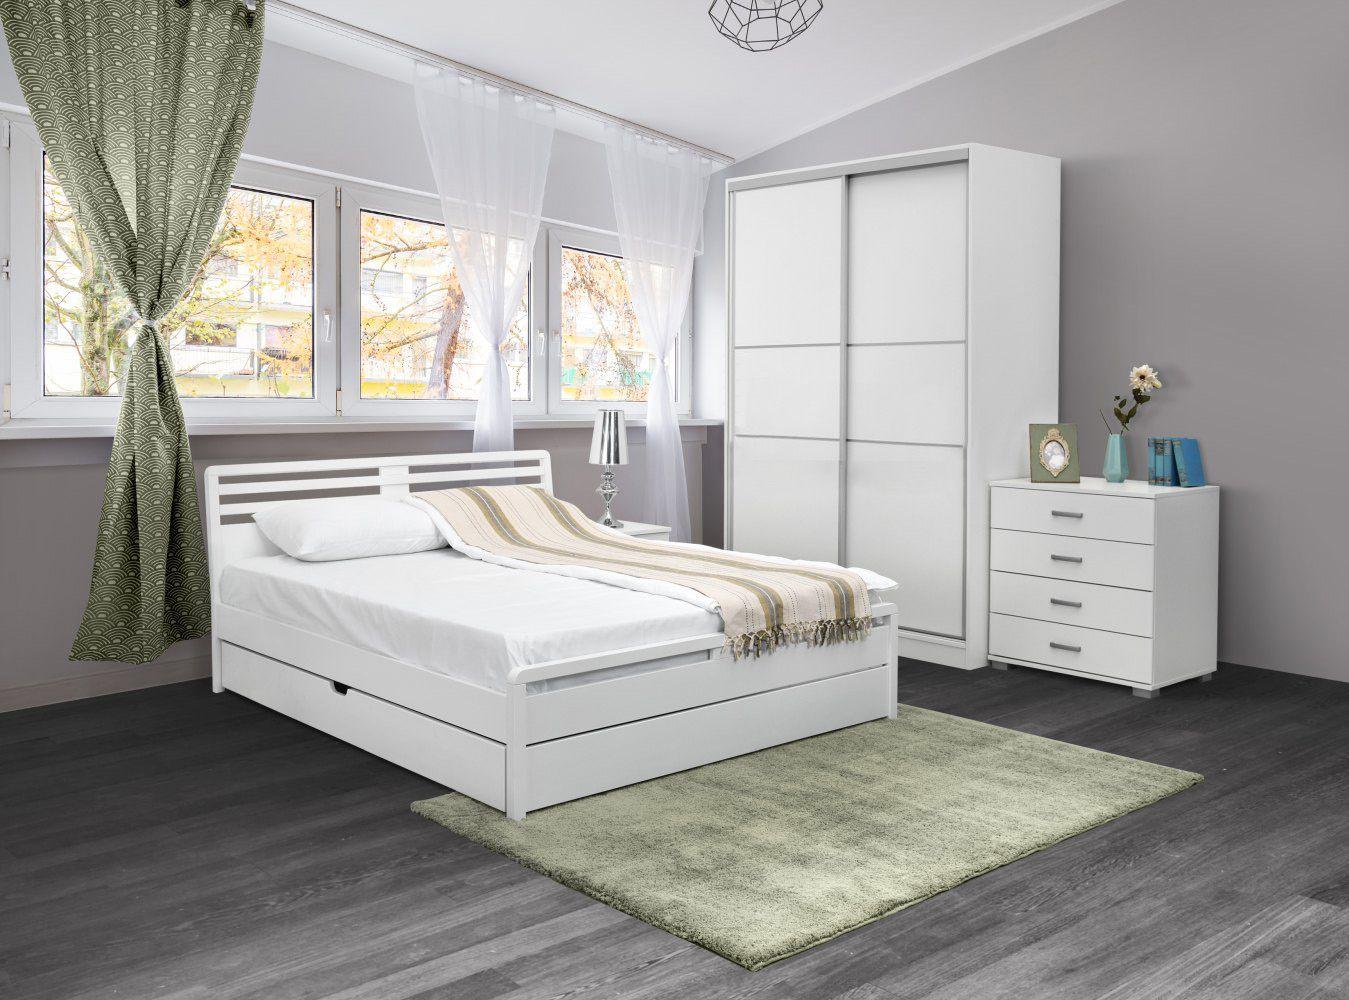 Schlafzimmer Komplett - Set G Pontevedra, 6-teilig, teilmassiv, Farbe: Weiß